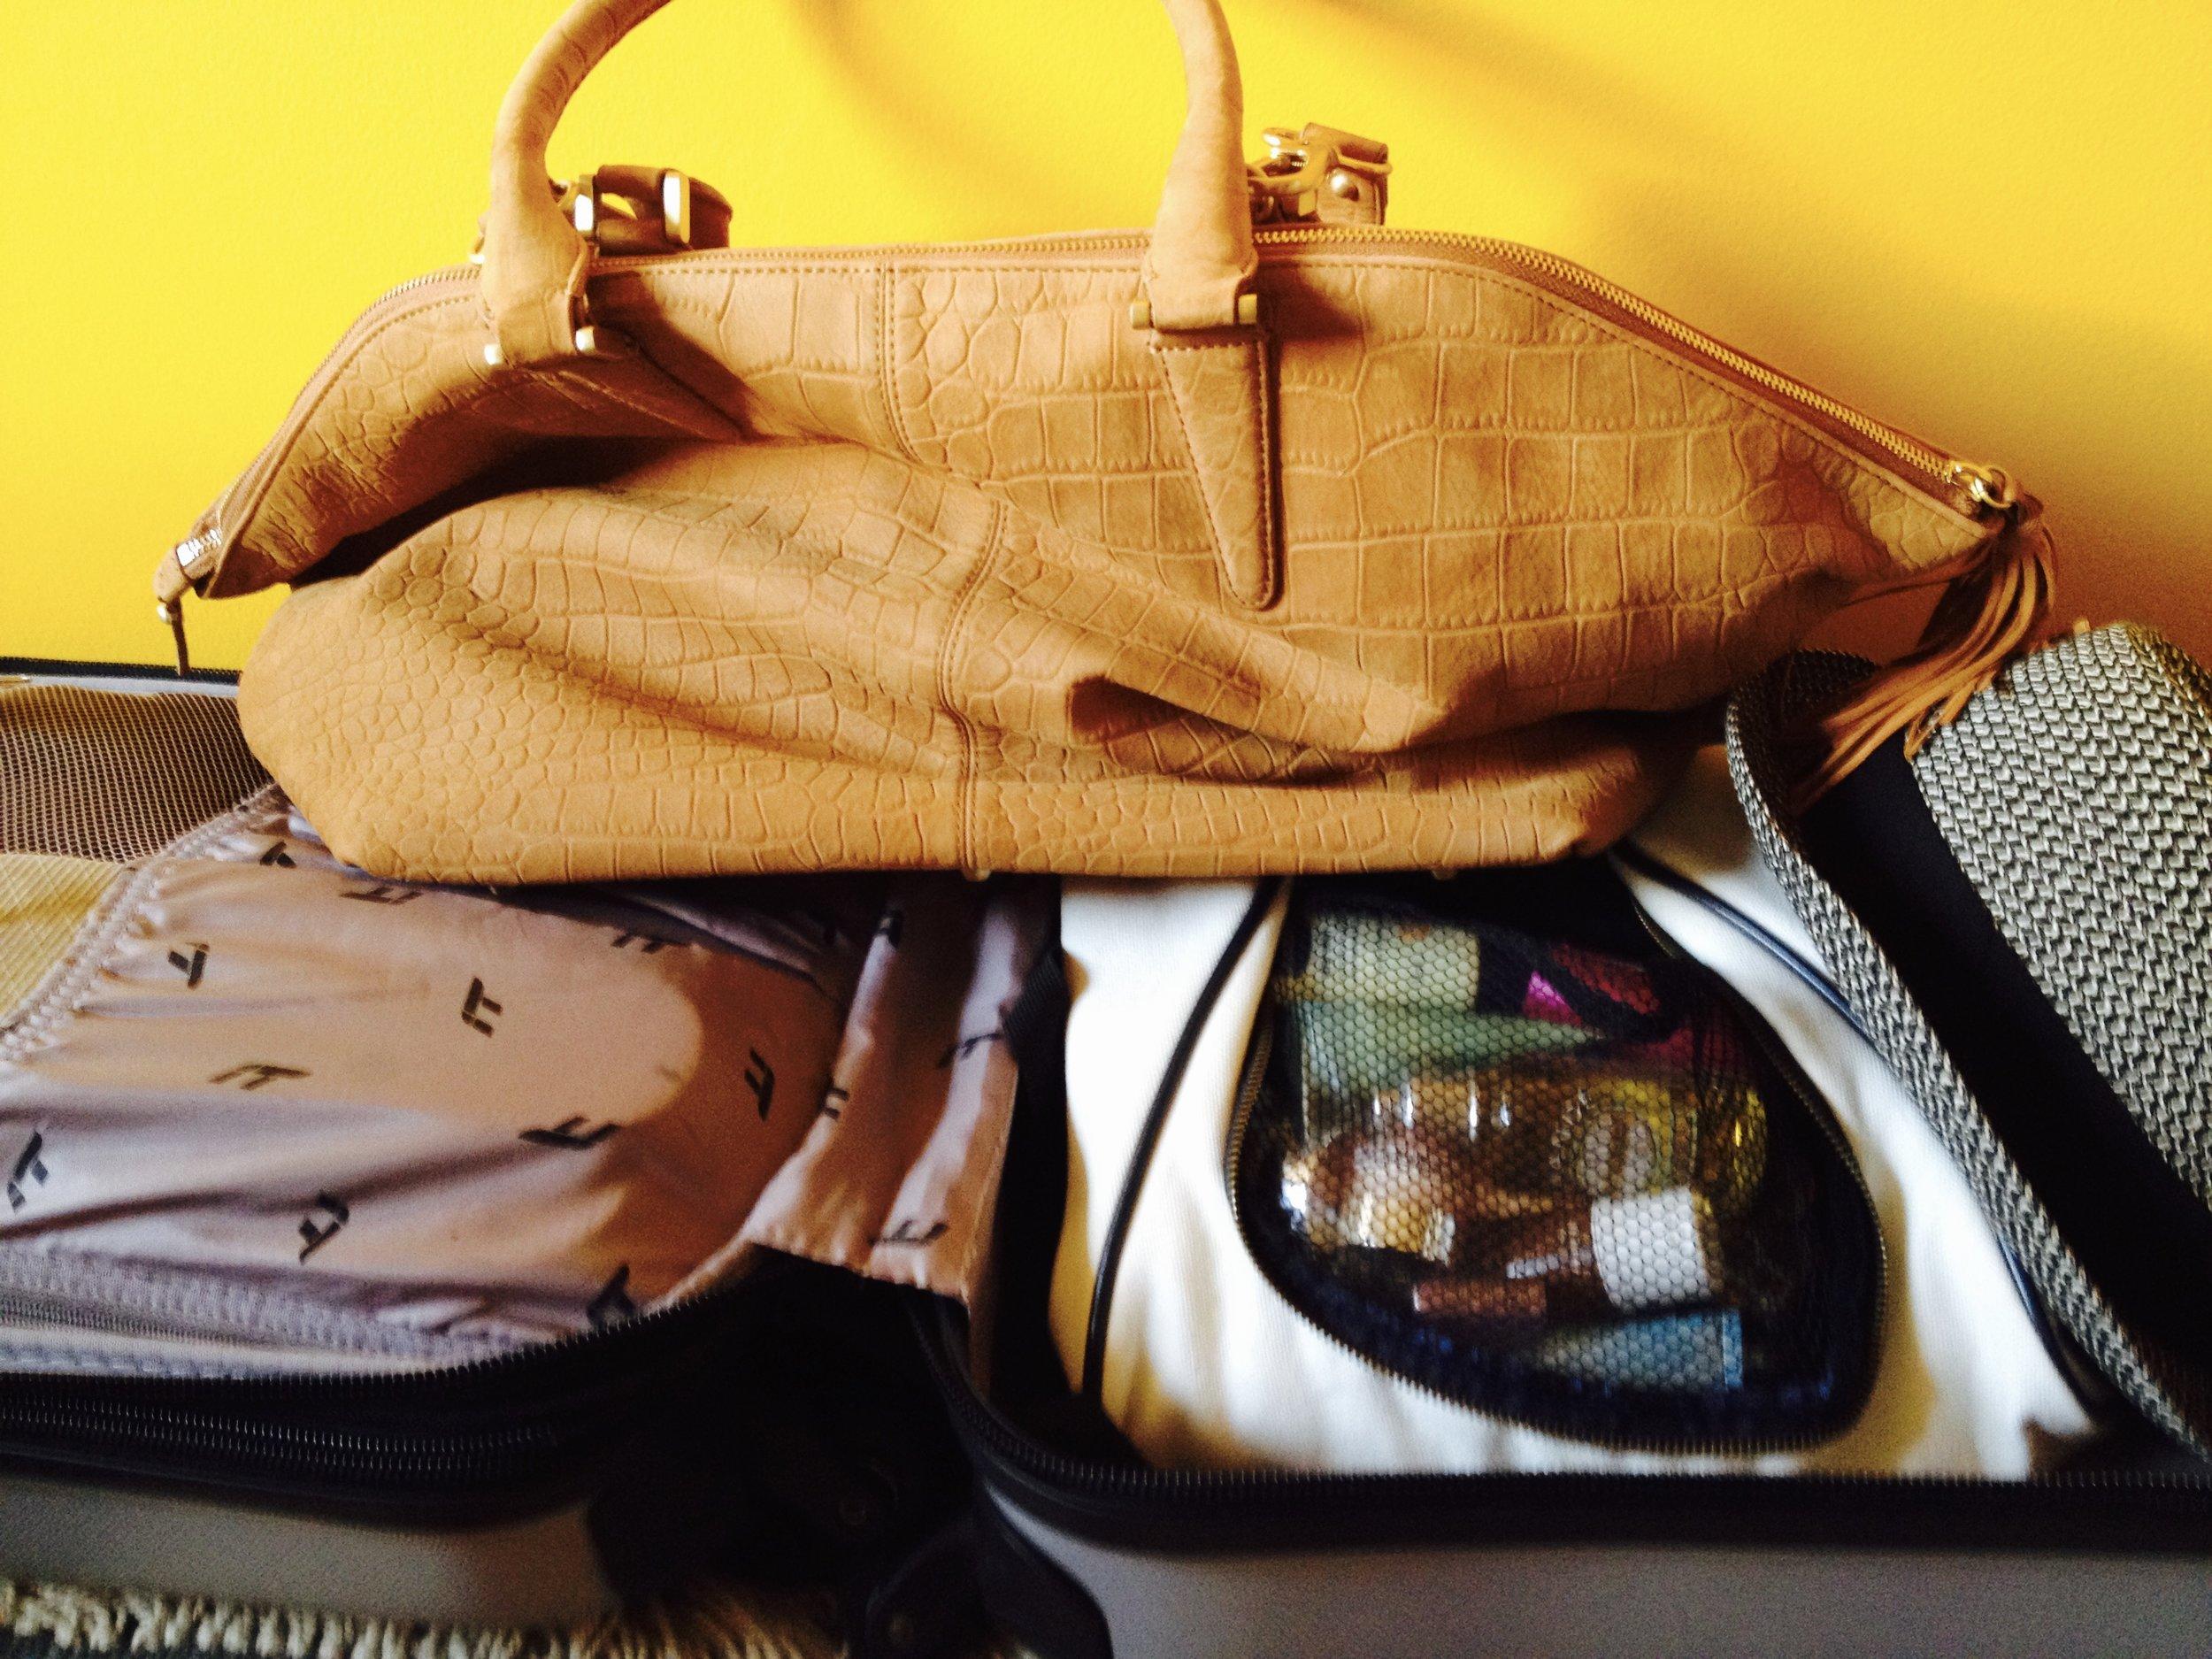 My soft leather handbag